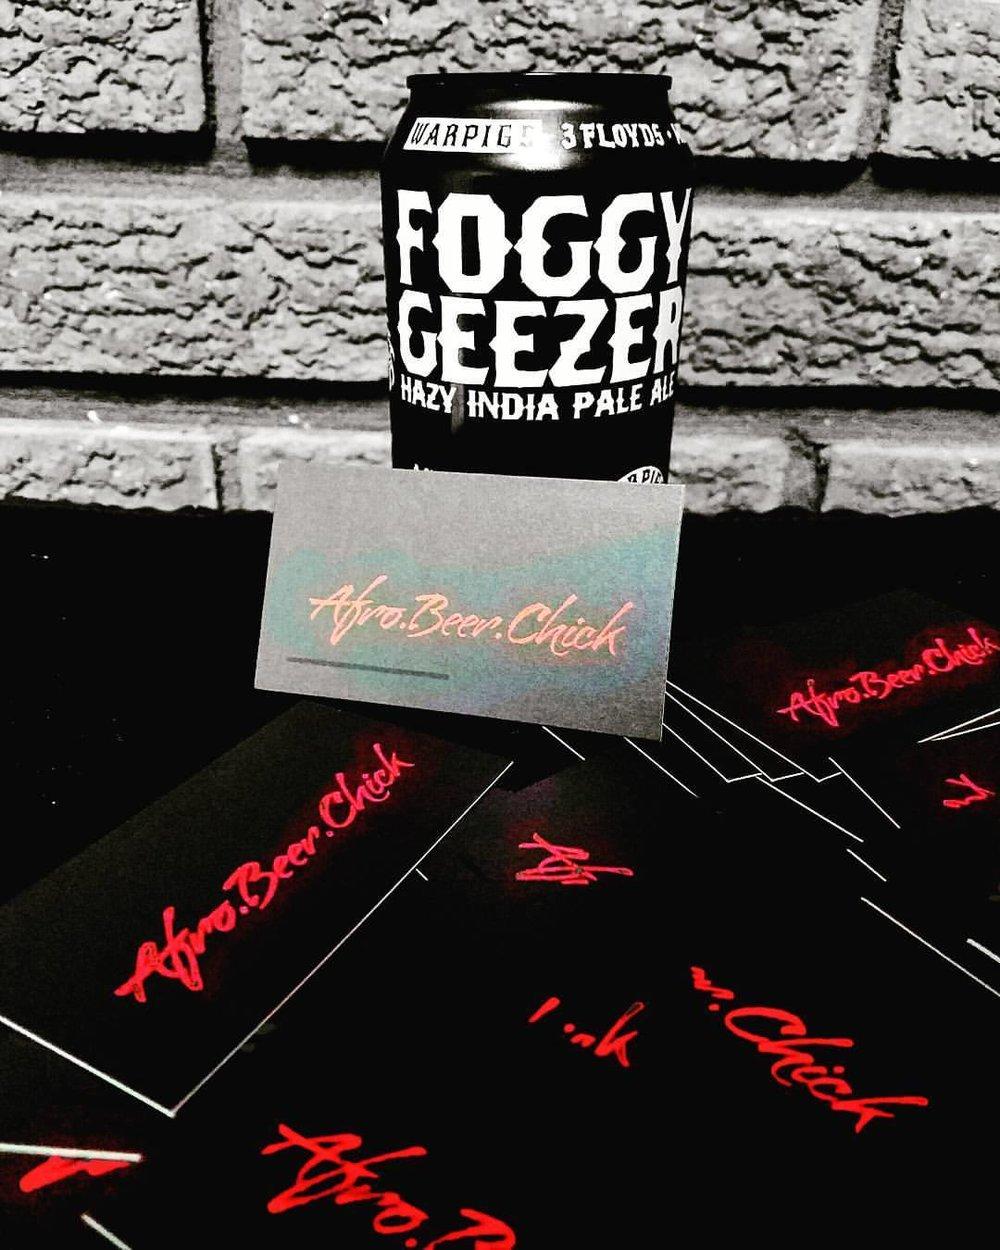 Mikkeller & 3 Floyds Collab - Foggy Geezer